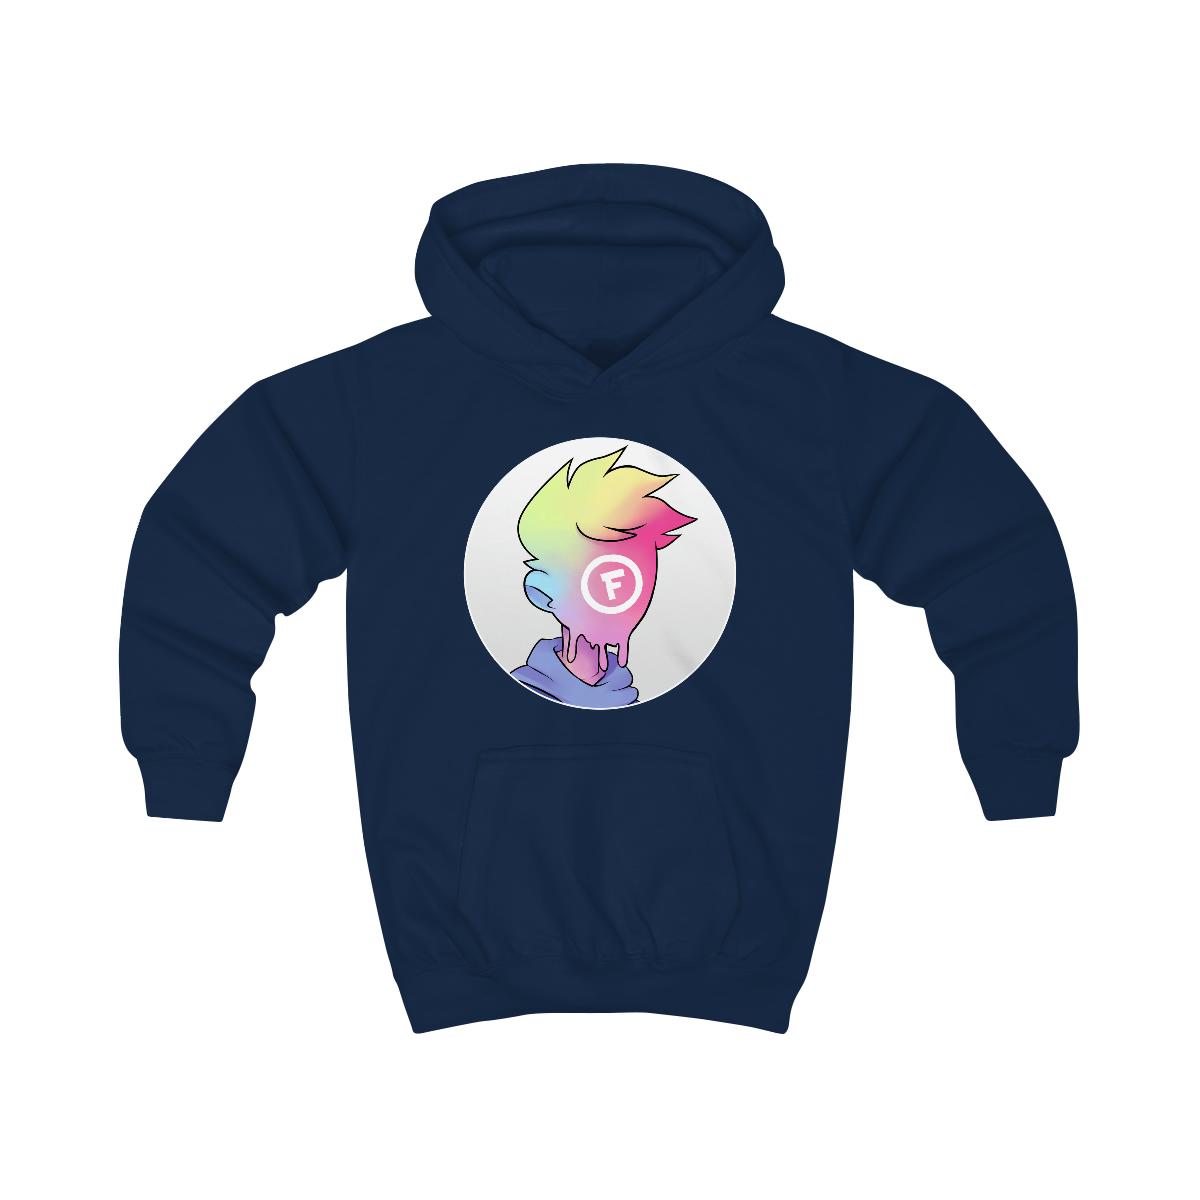 Kids - Fitz Logo Hoodie - Front Print